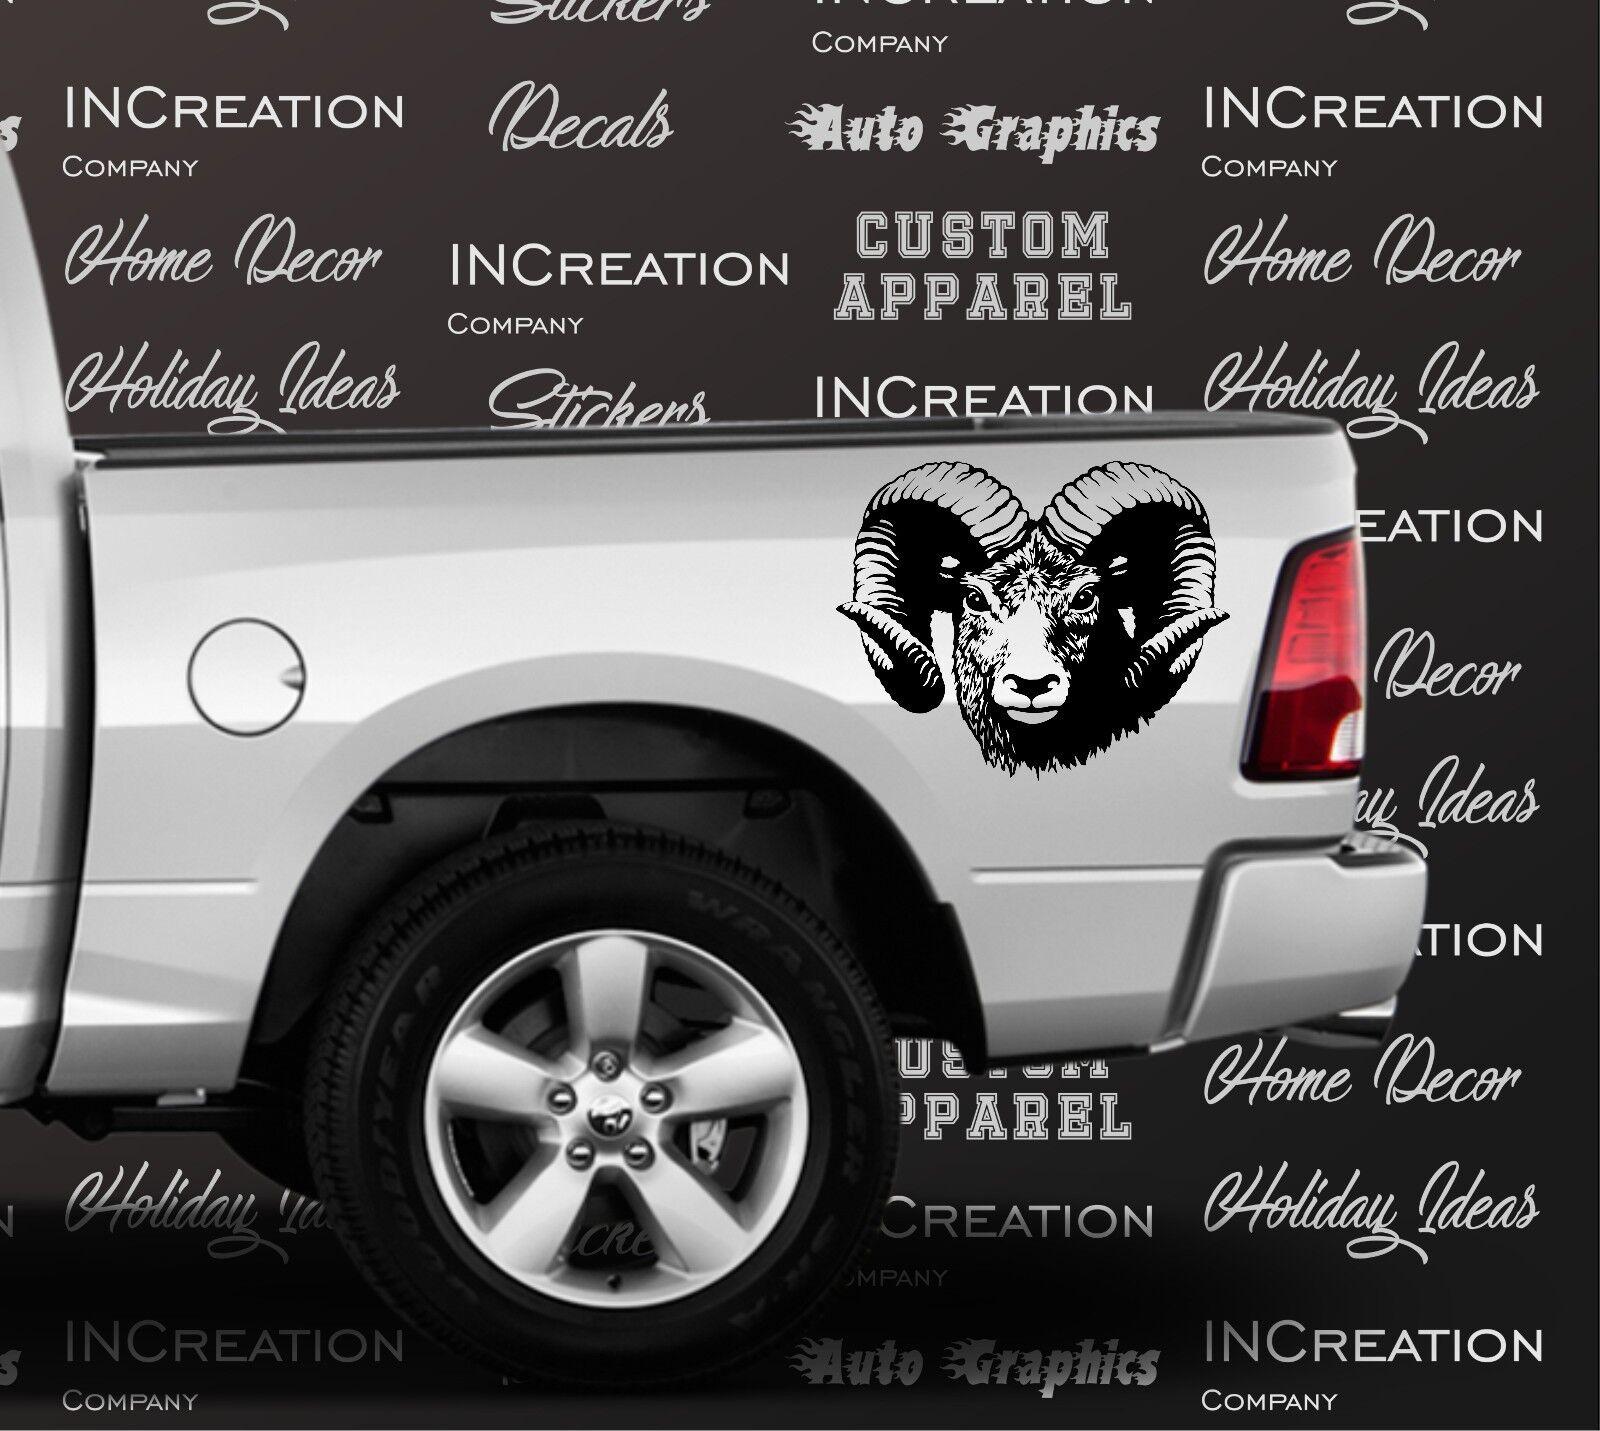 Moose Antler Hunting Hunter Shooting Vinyl Decal Decals Stickers Sty 2 For Sale Online Ebay [ 1431 x 1600 Pixel ]